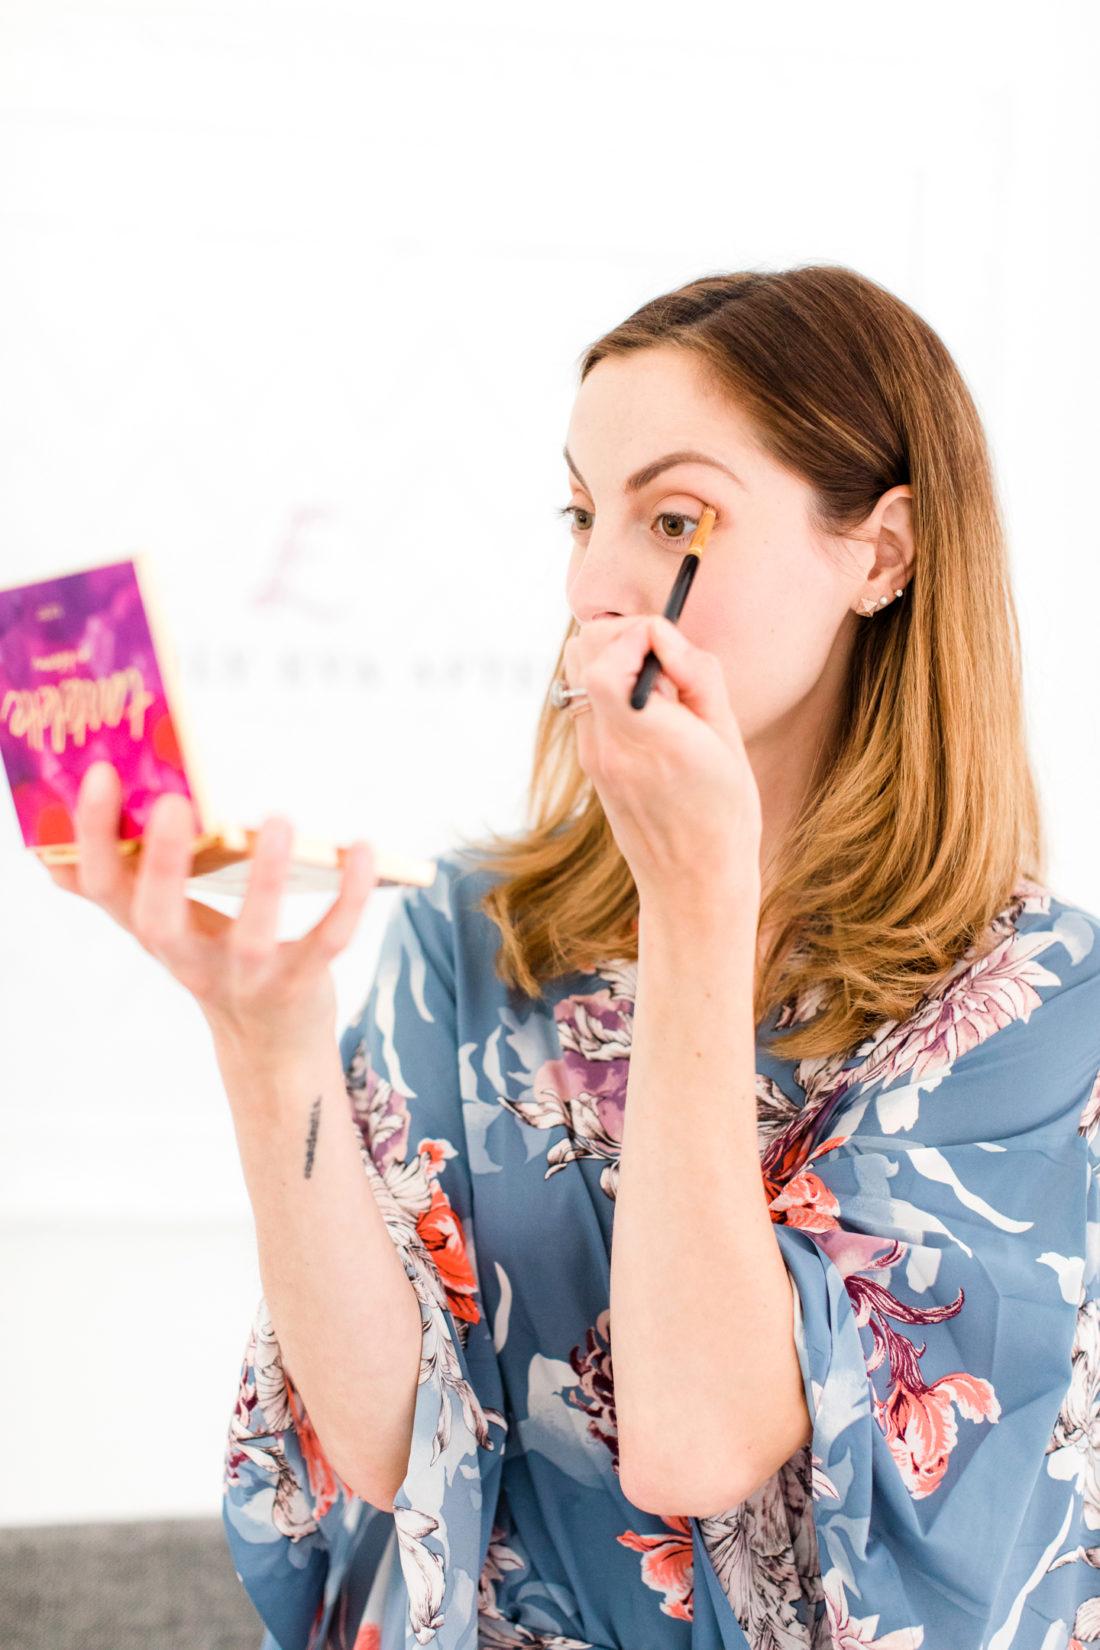 Eva Amurri Martino applies eyeshadow to the outer crease of her eye